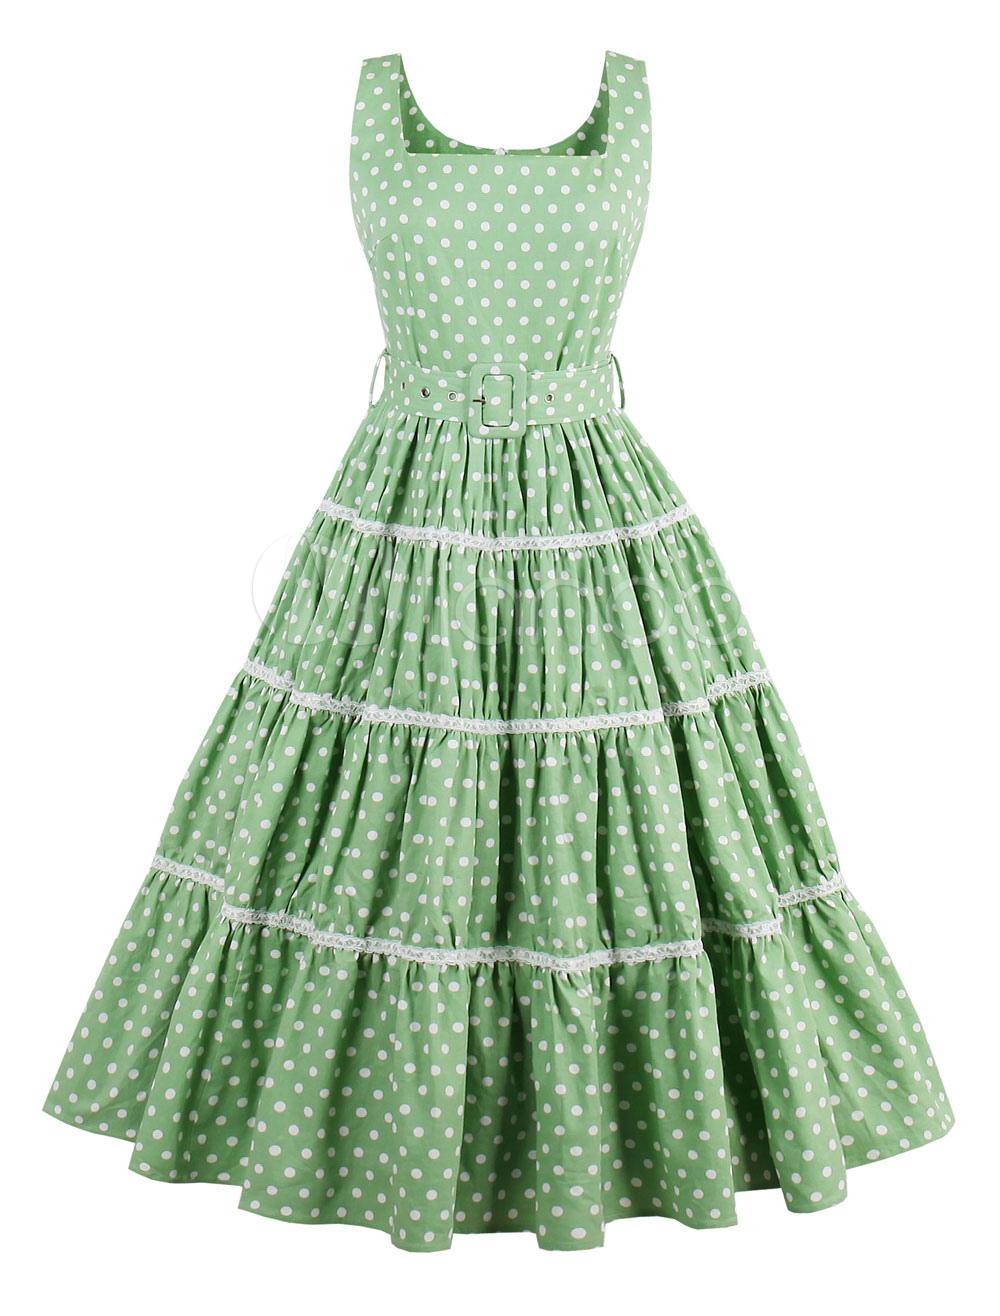 Women Green Dress Vintage Square Neck Sleeveless Polka Dot Print Pleated Skater Dresses (Women\\'s Clothing Vintage Dresses) photo